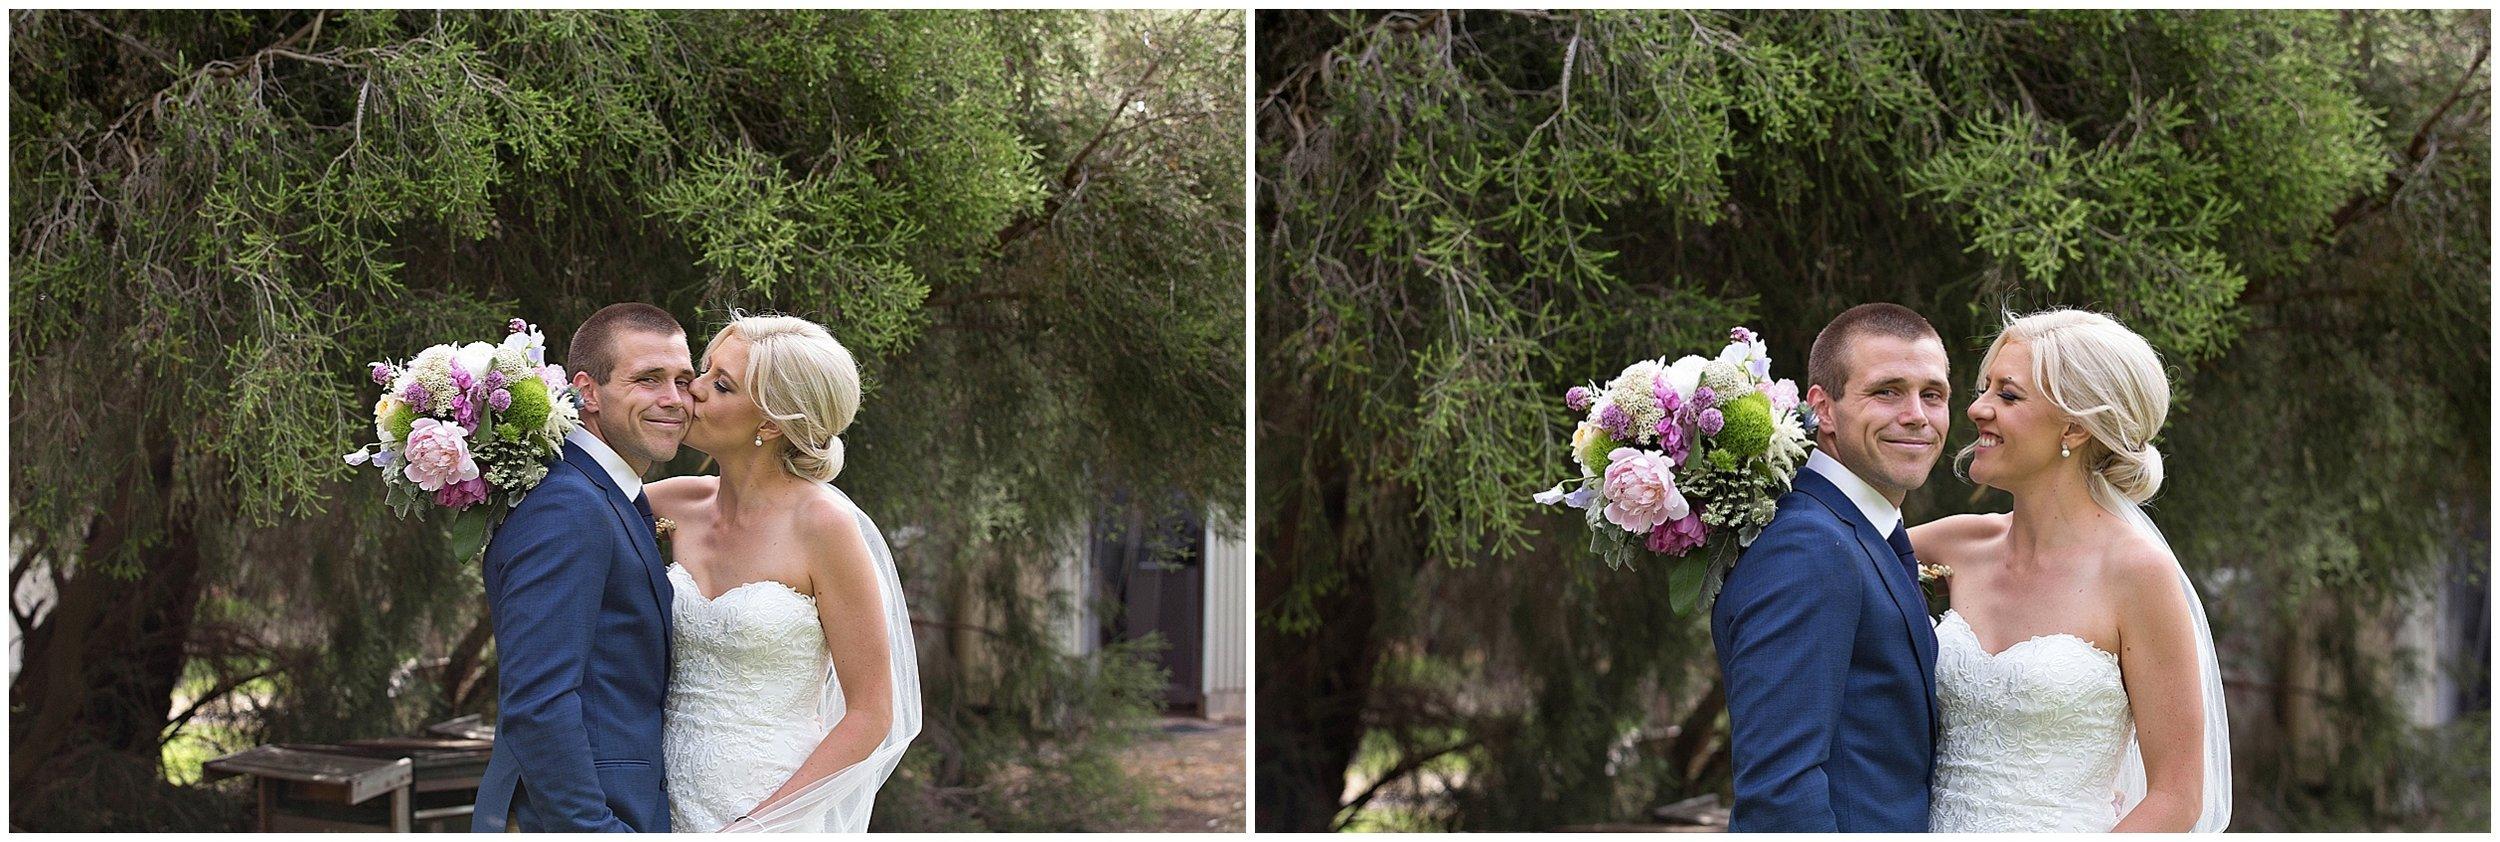 shepparton-wedding-photographer_0116.jpg